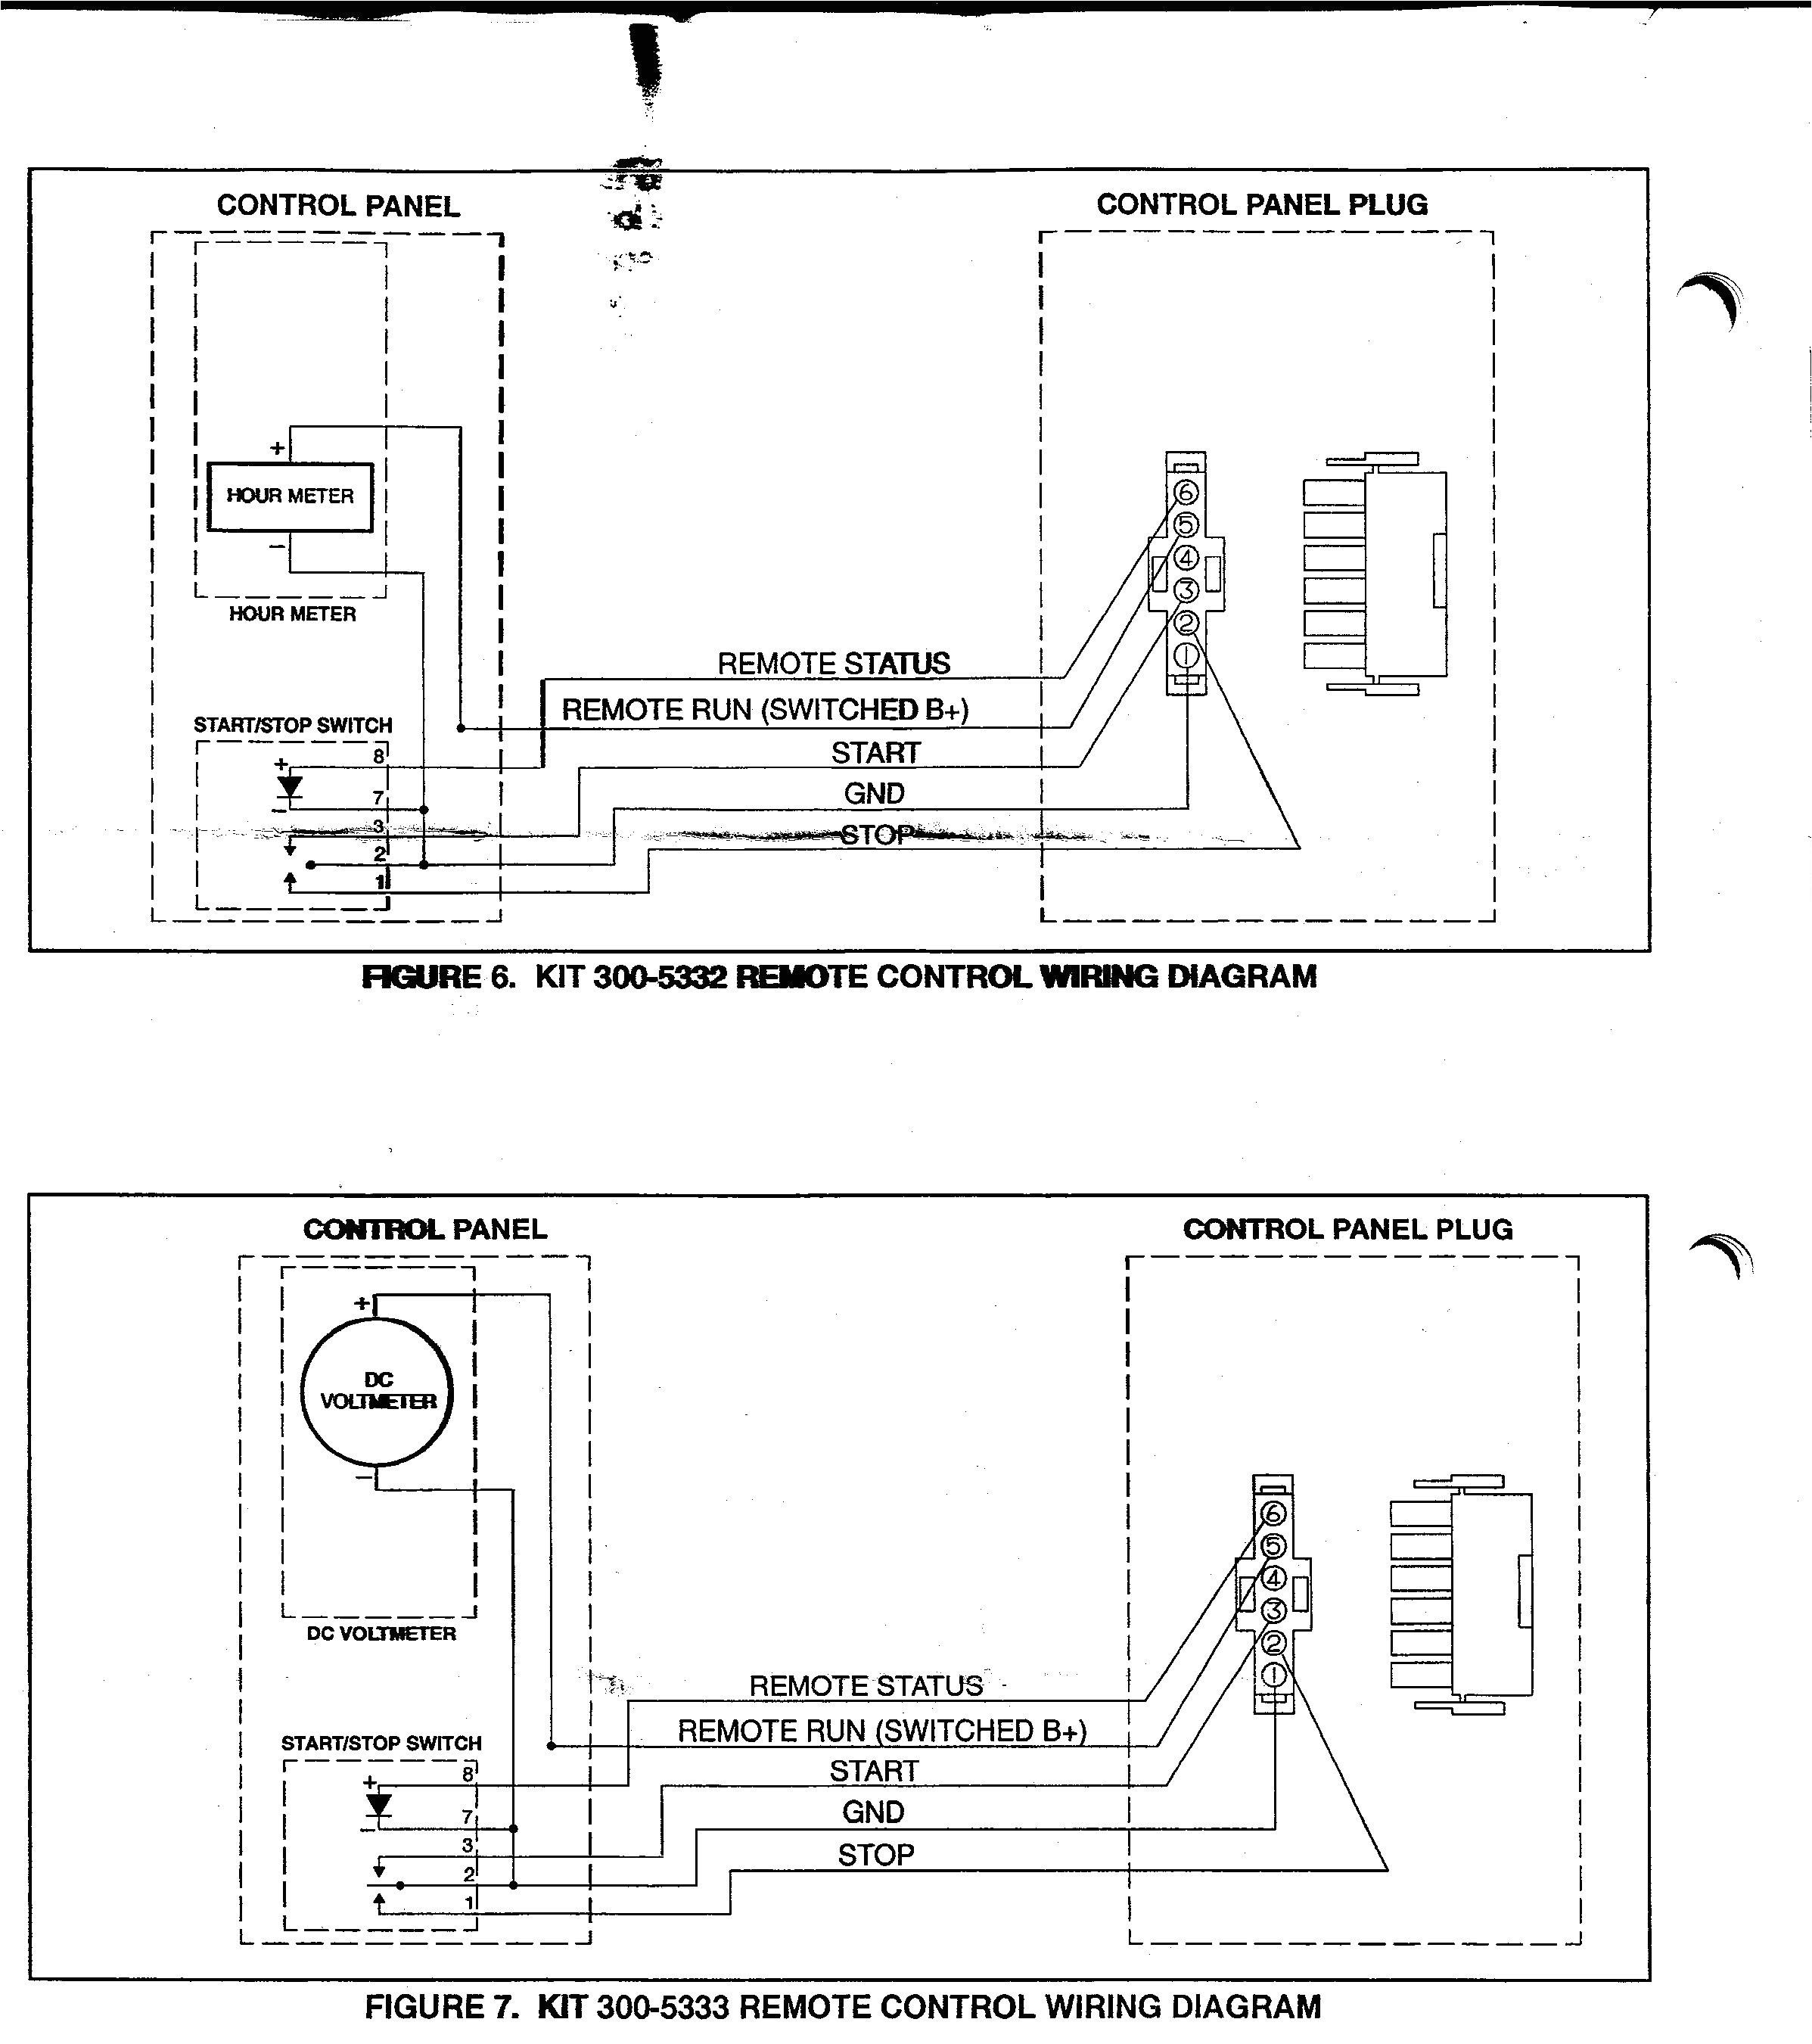 wiring diagram onan 4 0 generator recent rv starter library e280a2 of png resize u003d242258 all jpg